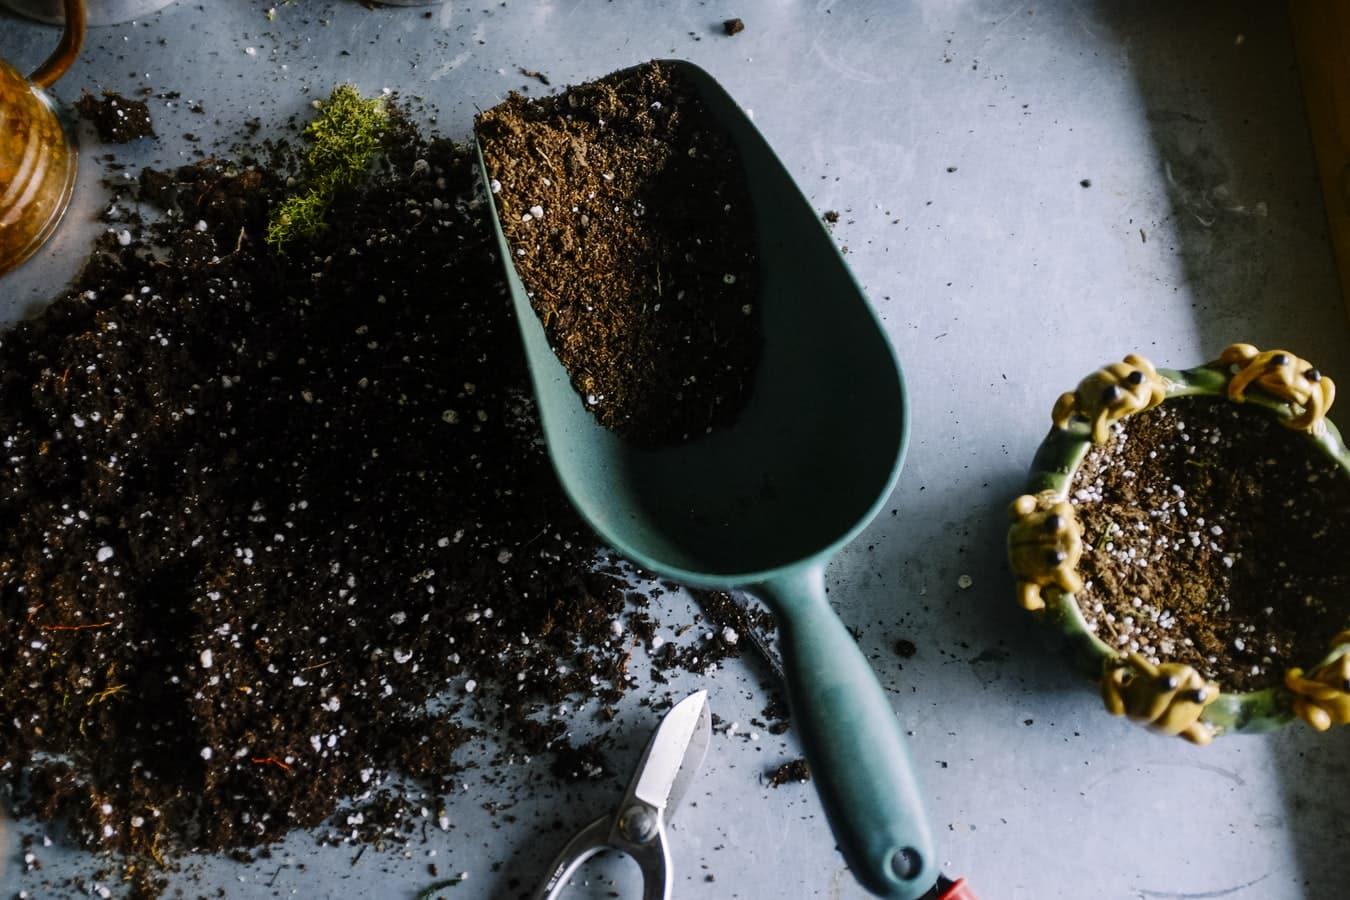 outils de jardinage terre pelle jardin vert